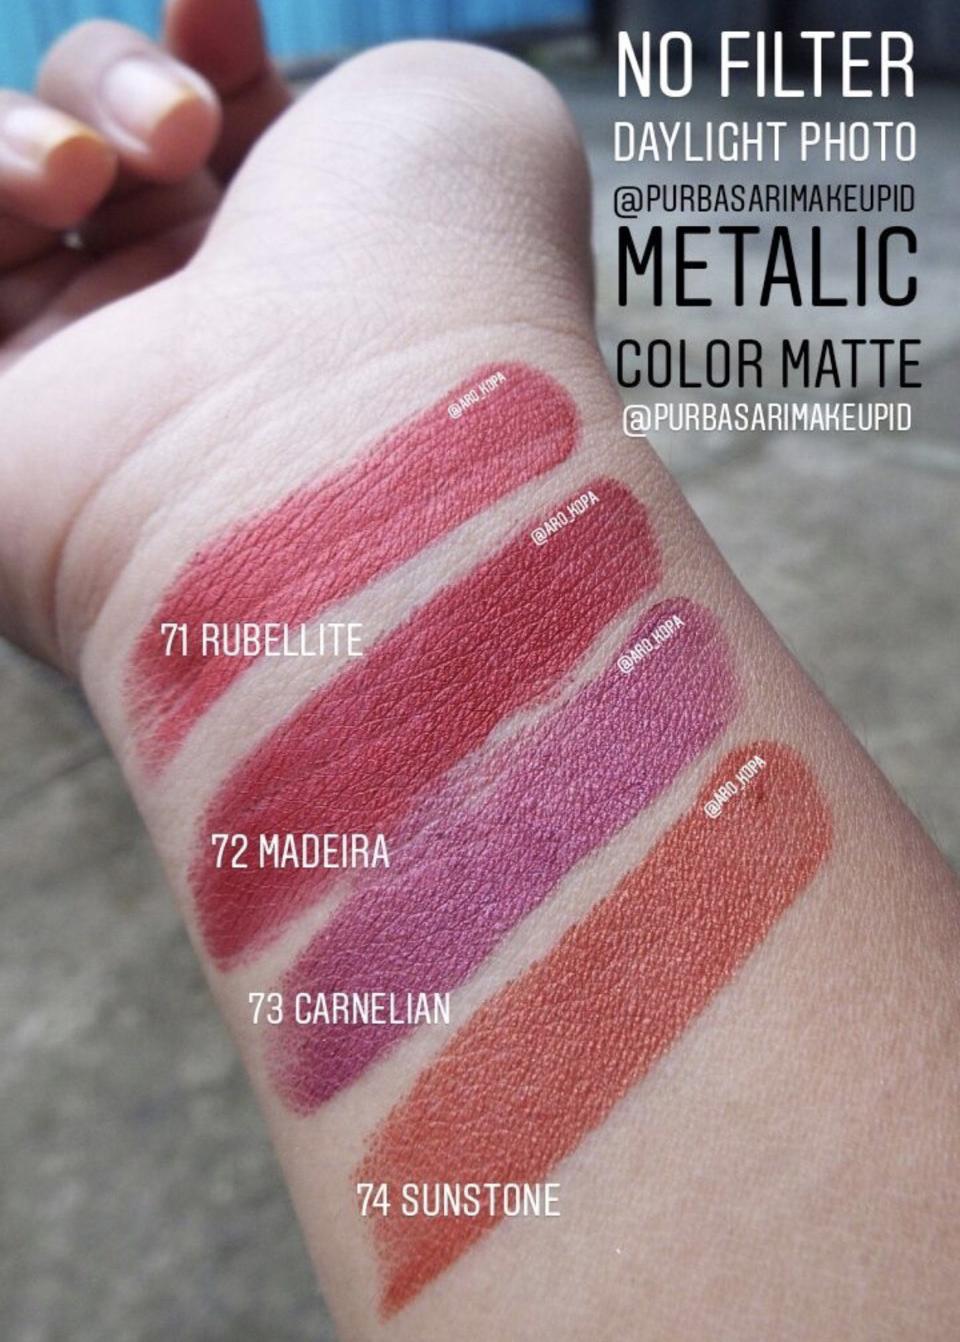 Tutuskirtjournal Review Purbasari Metallic Color Matte Lipstick Lipstik Collor Setelah